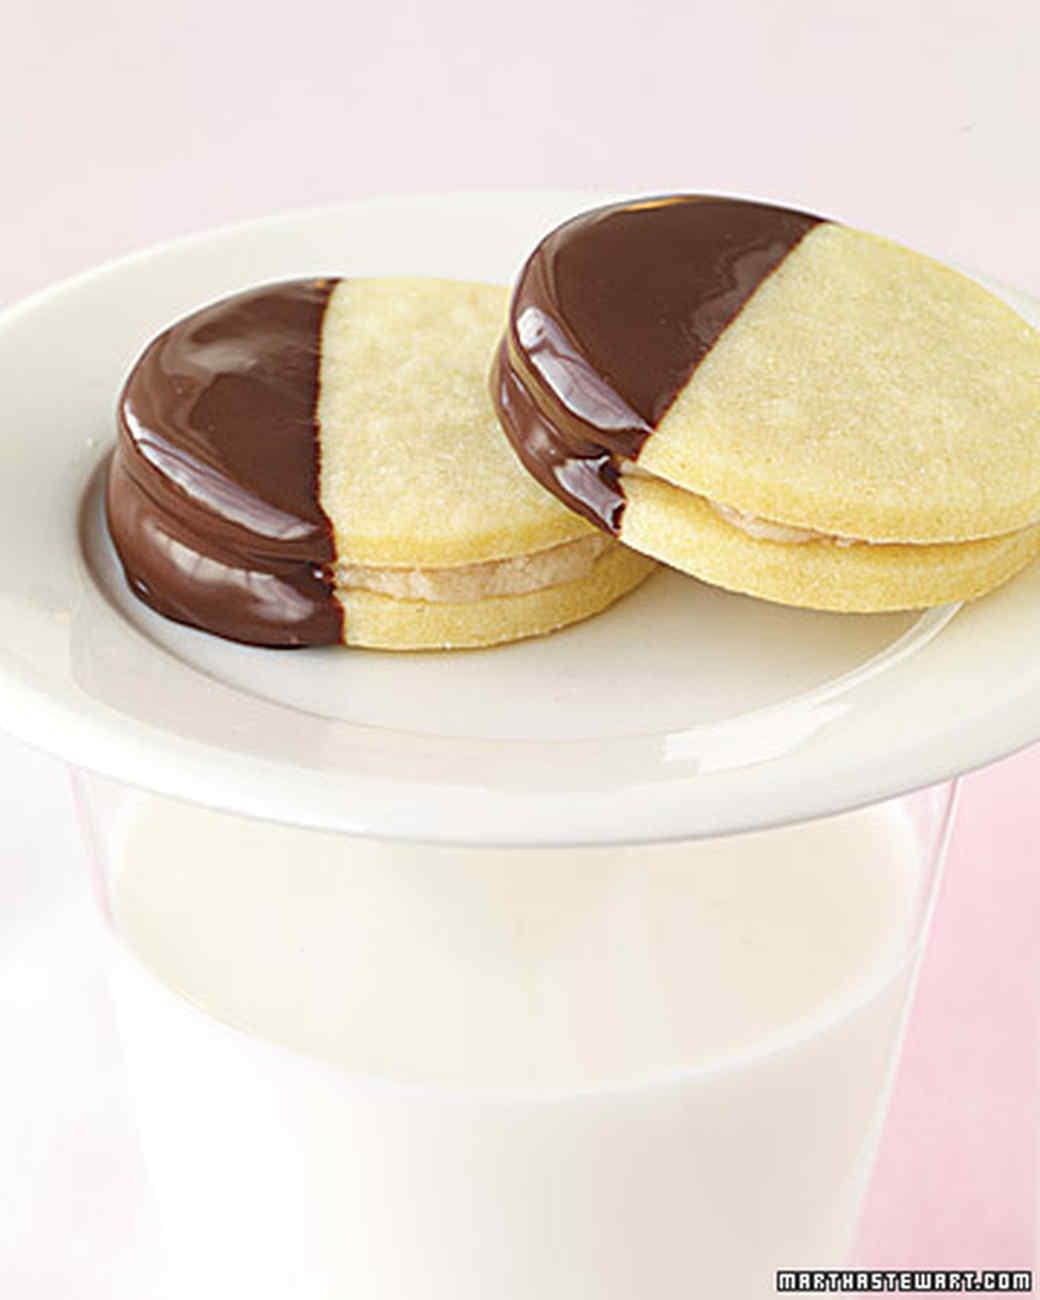 Butter Cookie Sandwiches with Chestnut Cream